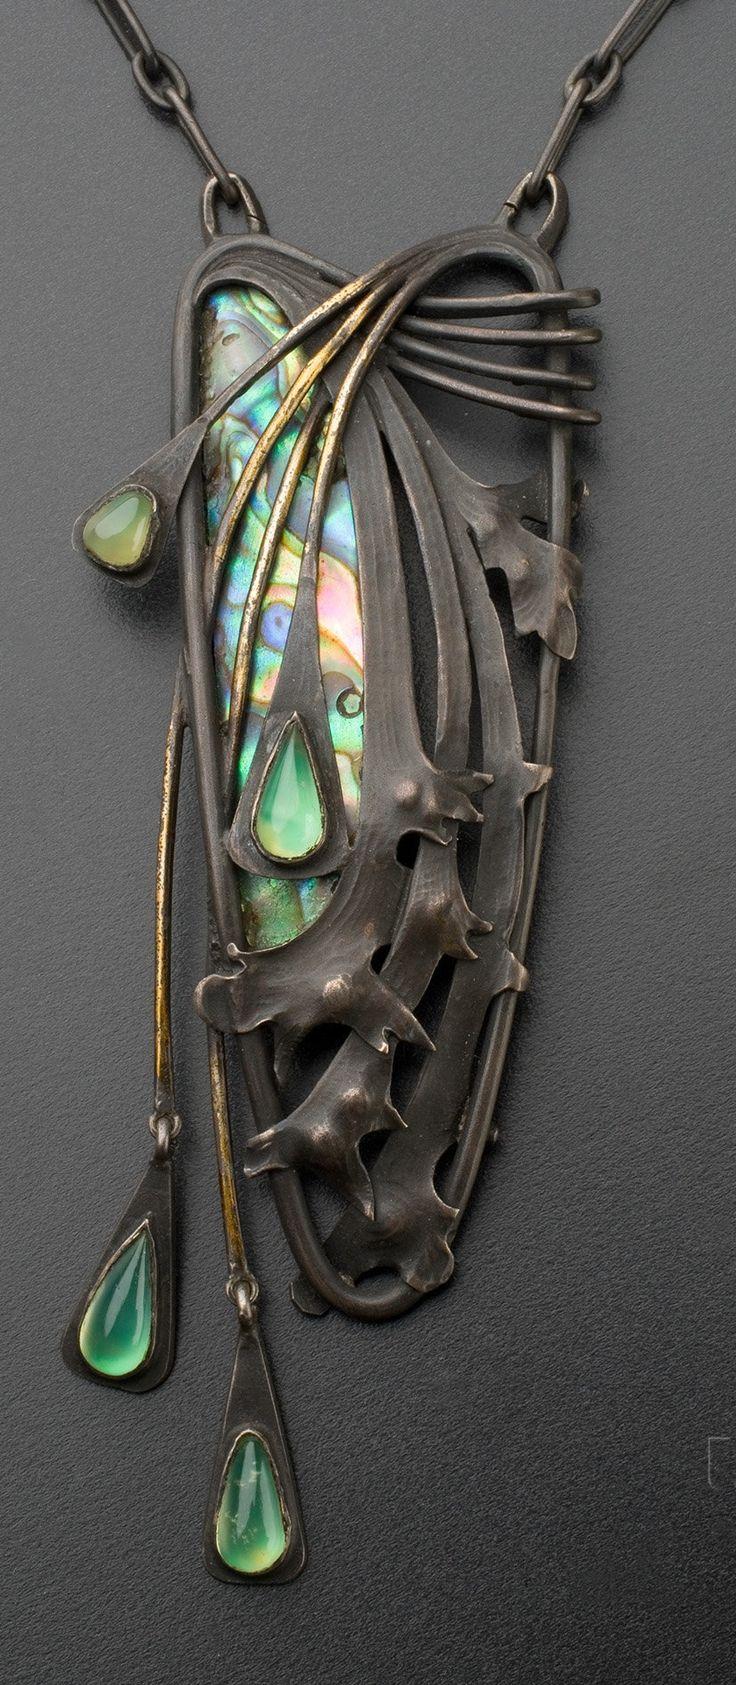 An Art Nouveau silver, mother of pearl and gem-set pendant necklace, by Němec…